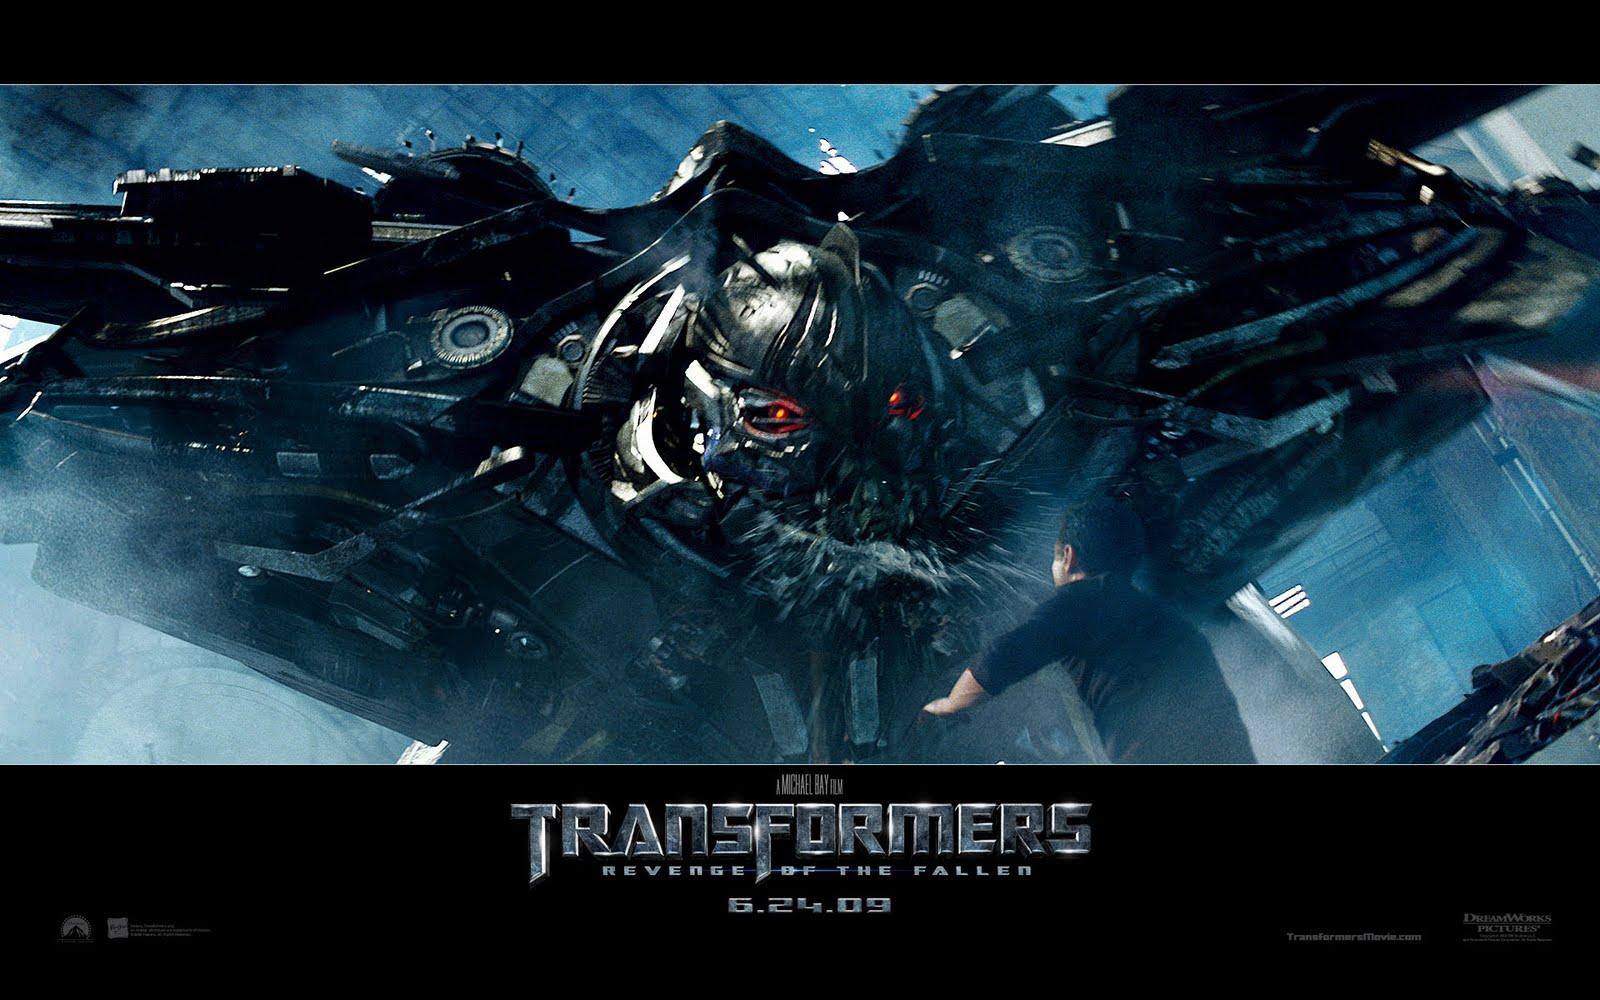 http://2.bp.blogspot.com/-XN5c93e5E9c/TmeYLykT3DI/AAAAAAAAA-I/B7NlxcSqjkU/s1600/15_Transformers_2_Wallpapers_HD__1920_X_1200__www.HQPictures.tk-12.jpg_WallPaper_4.jpg